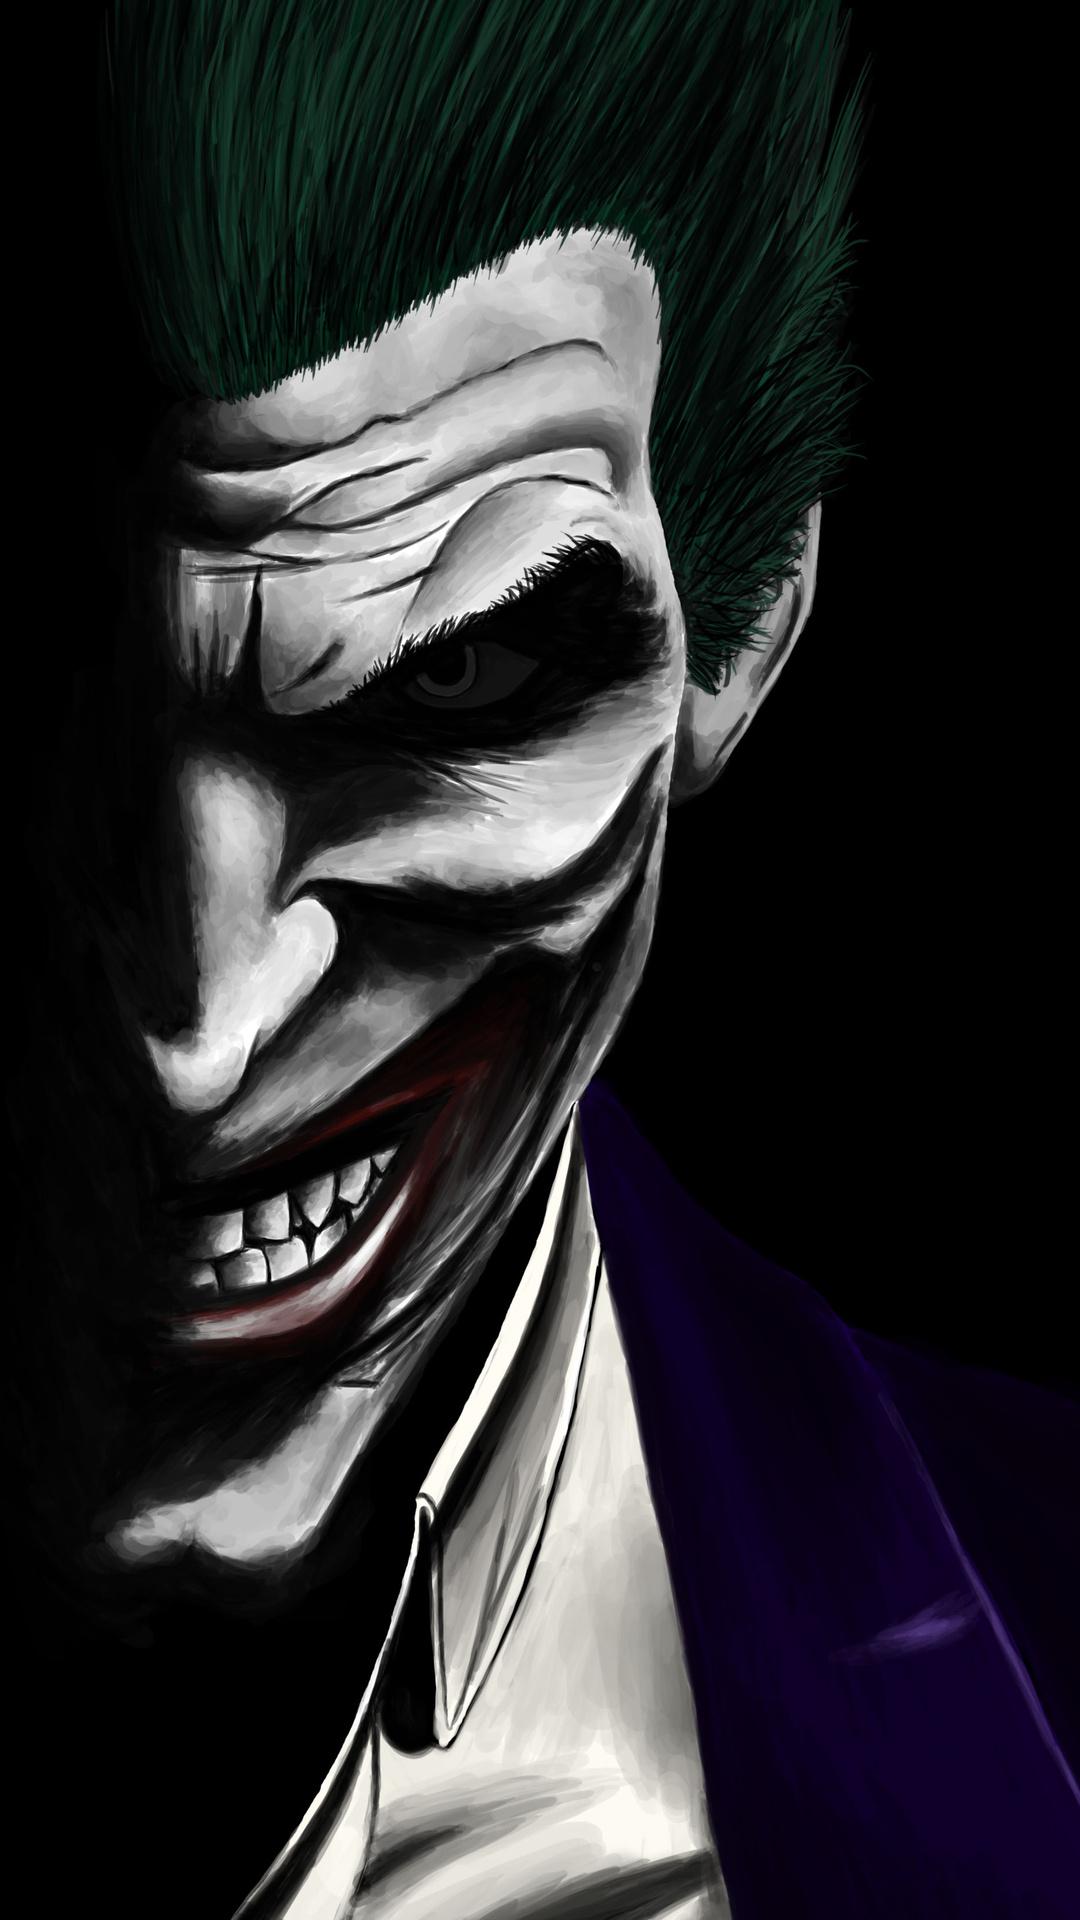 1080x1920 Joker Artwork 5k Iphone 7 6s 6 Plus Pixel Xl One